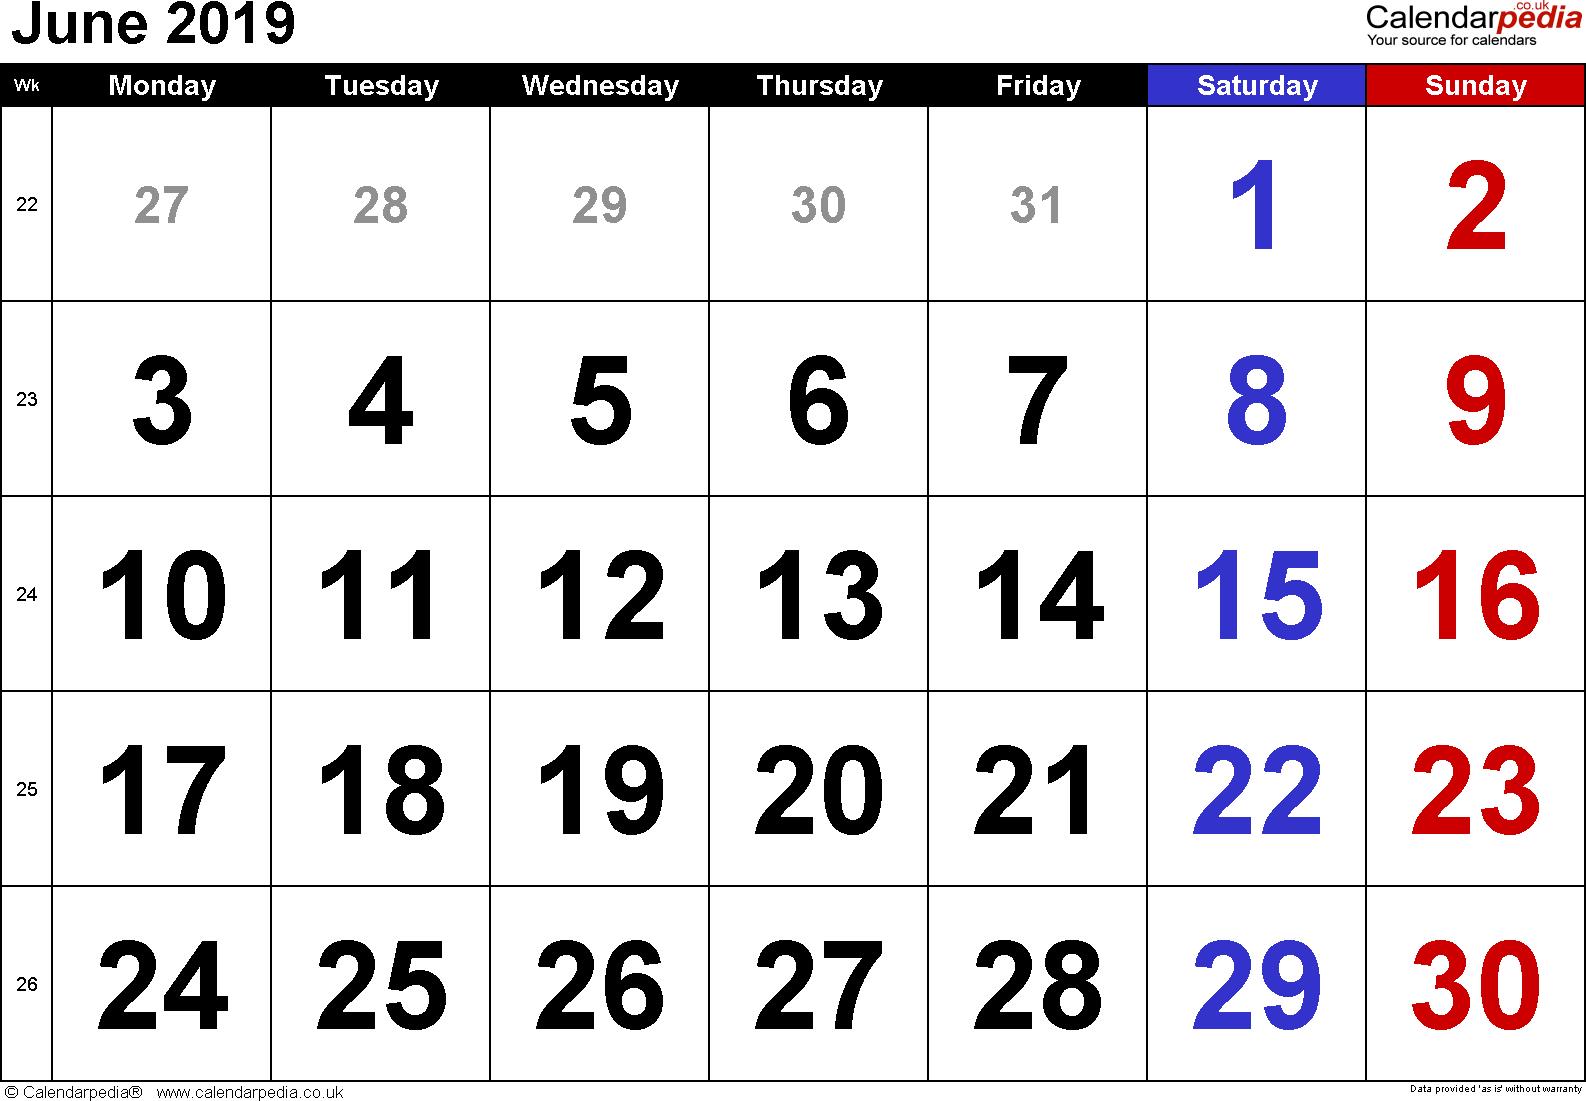 Calendar June 2019 Uk, Bank Holidays, Excel/pdf/word Templates June 2 2019 Calendar